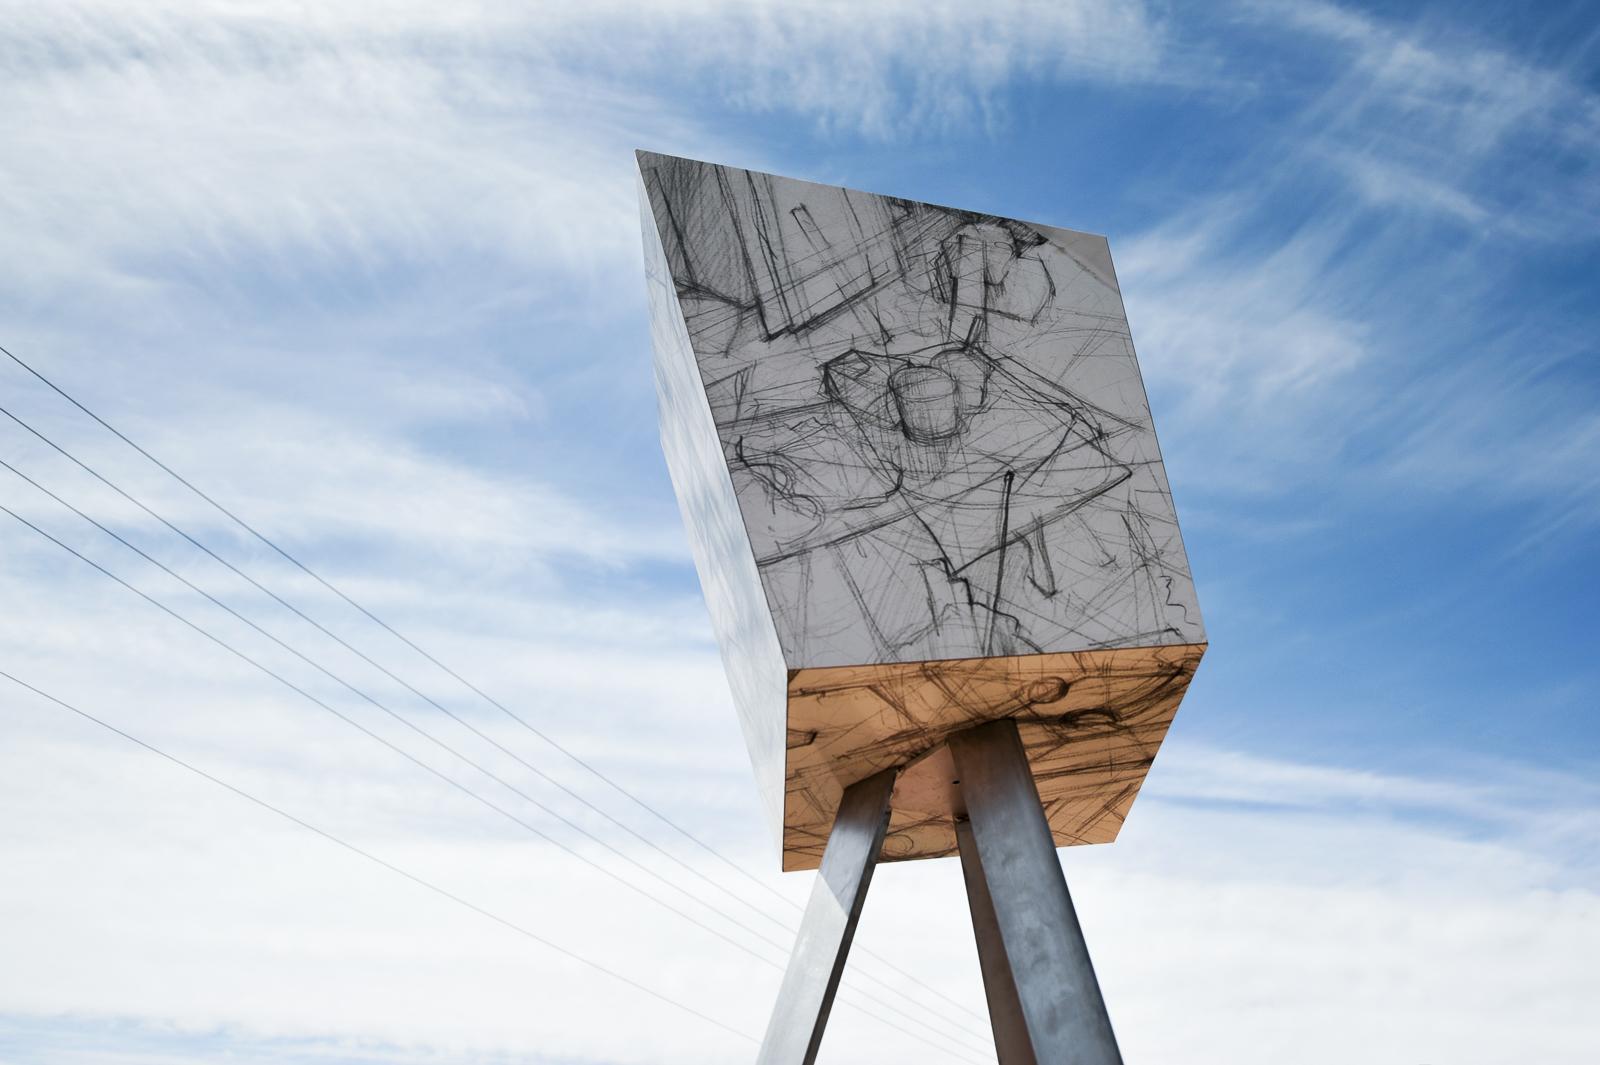 Ascot Park Public Artwork 5